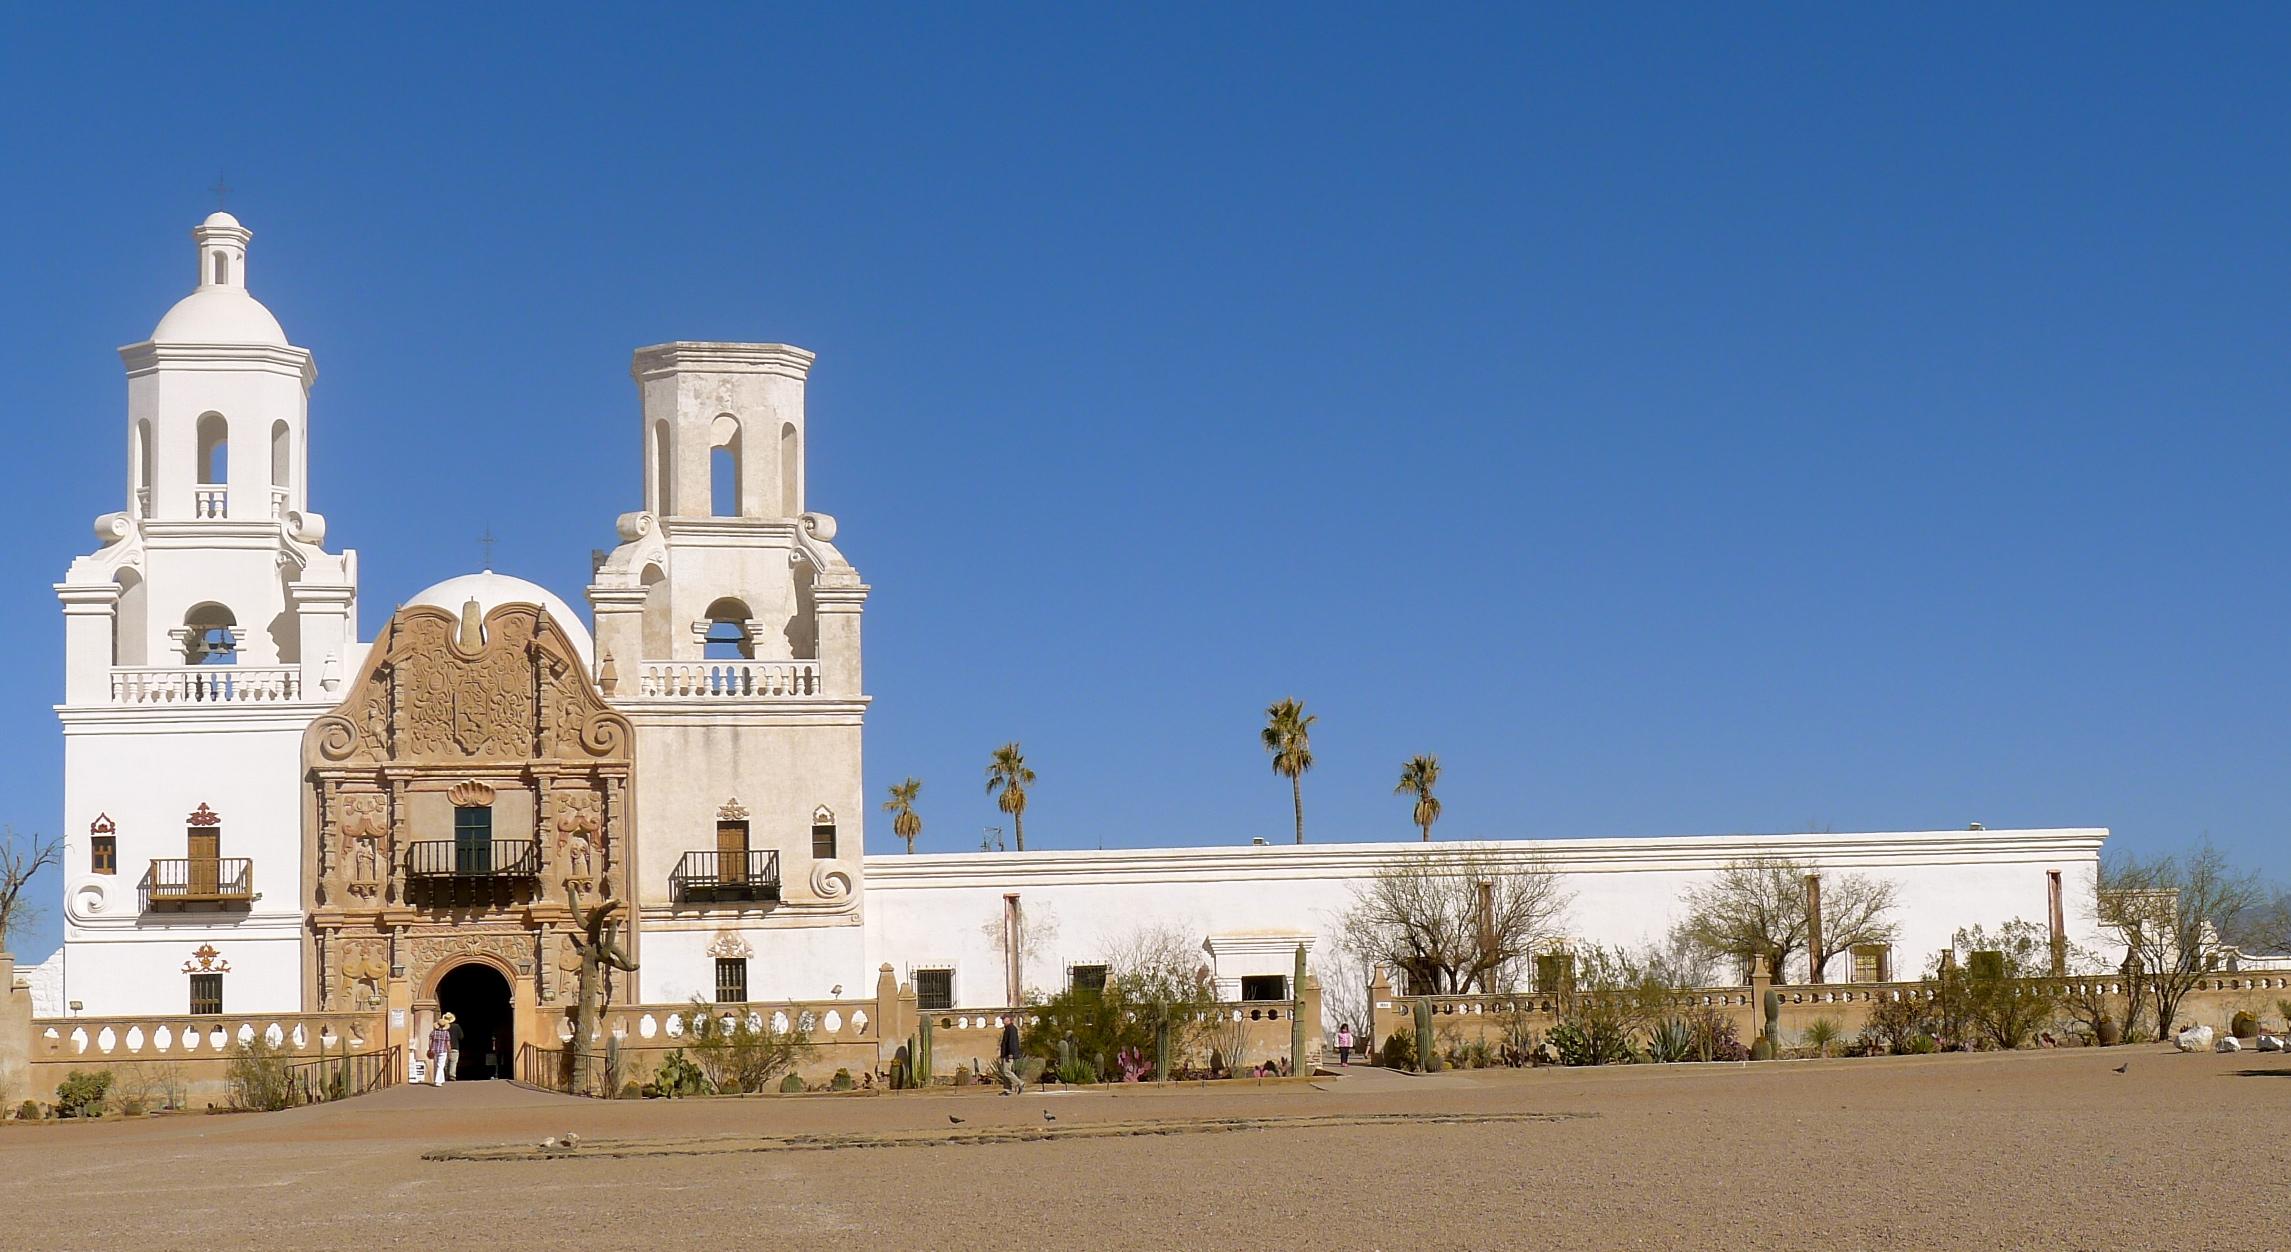 Mission San Xavier del Bac, Tucson, Arizona. Photo: Fr. Jboy Gonzales SJ, January 2011